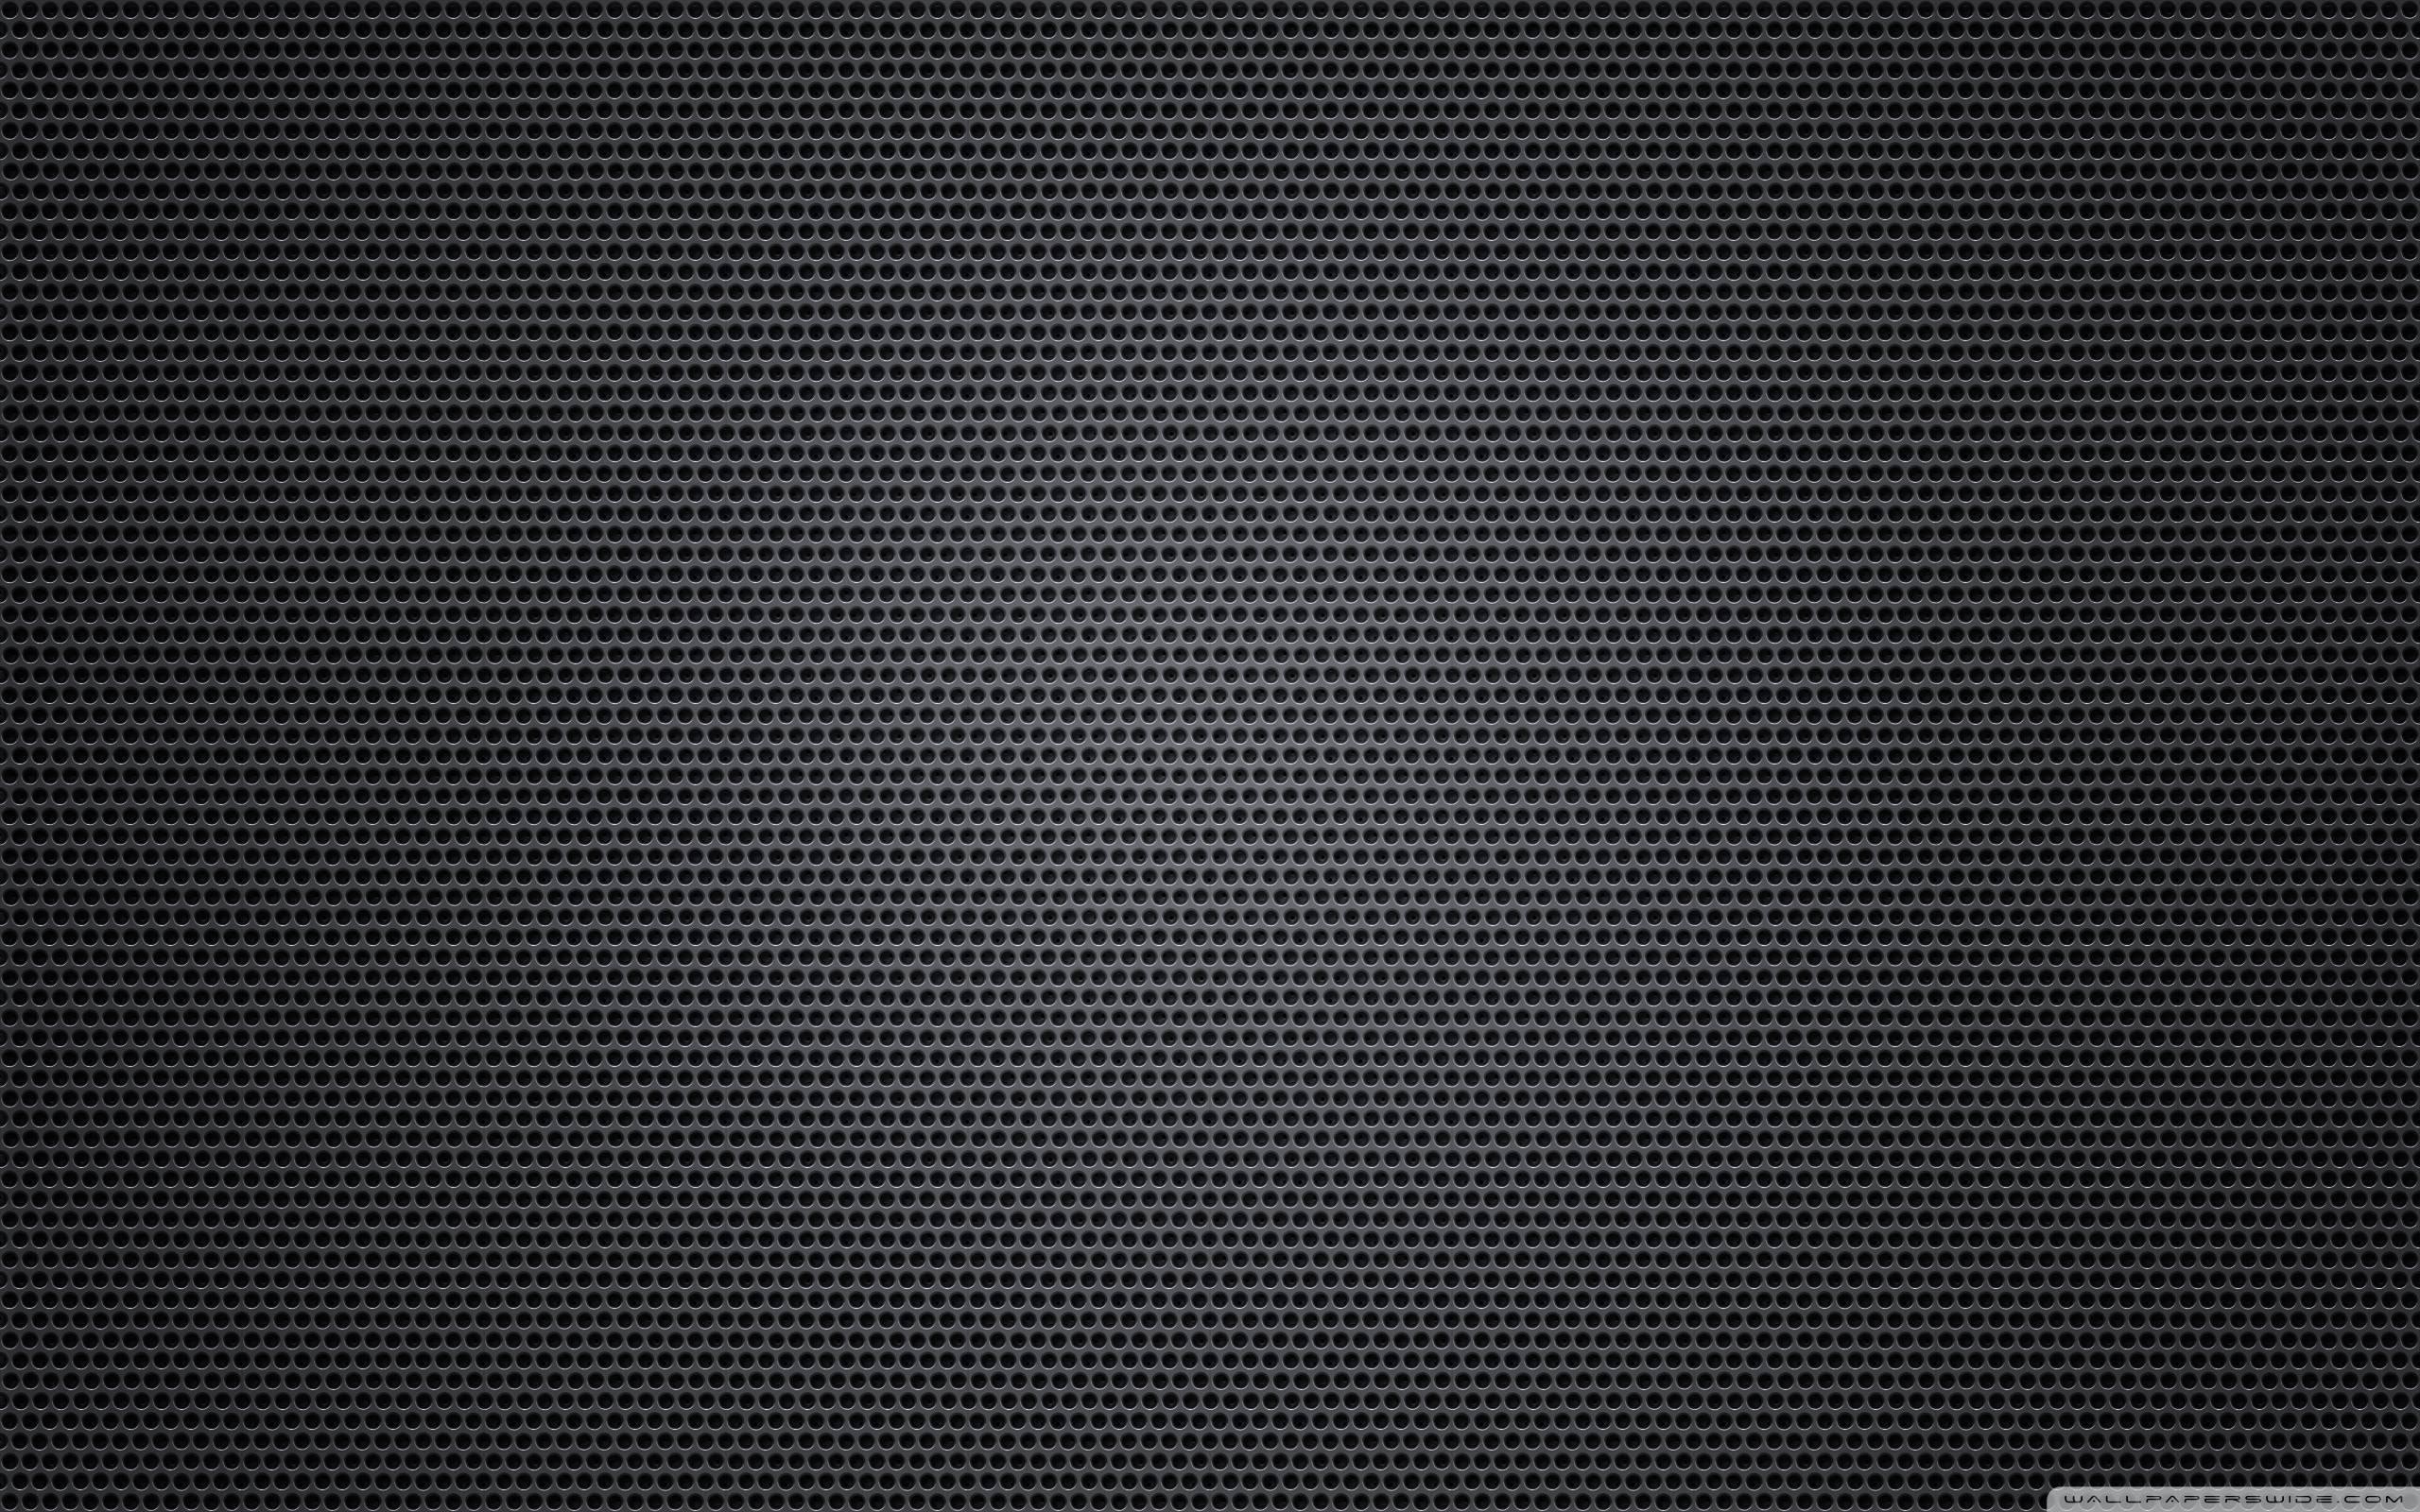 Black Metal Backgrounds